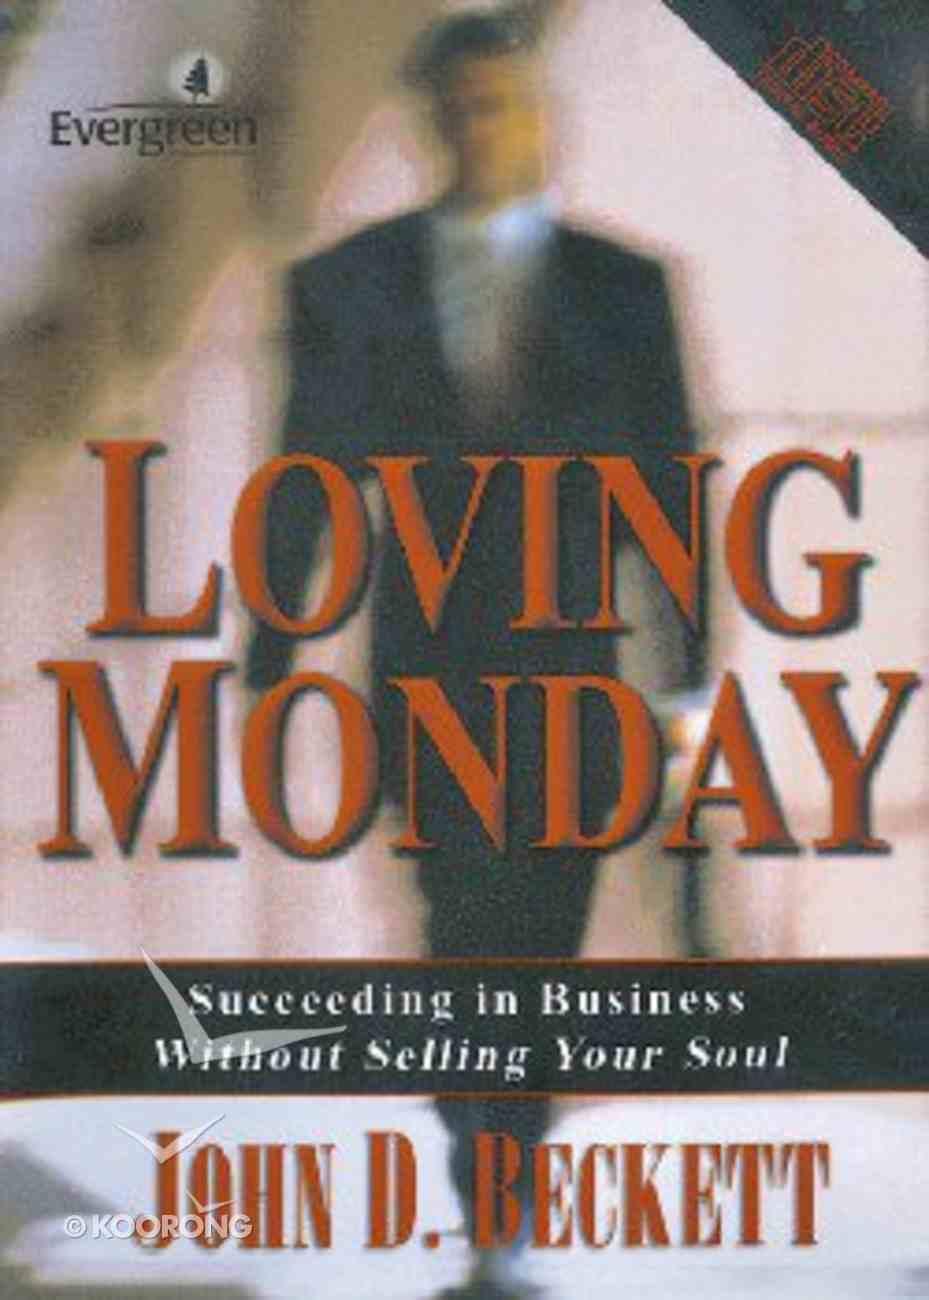 Loving Monday (3 Cd Set) CD